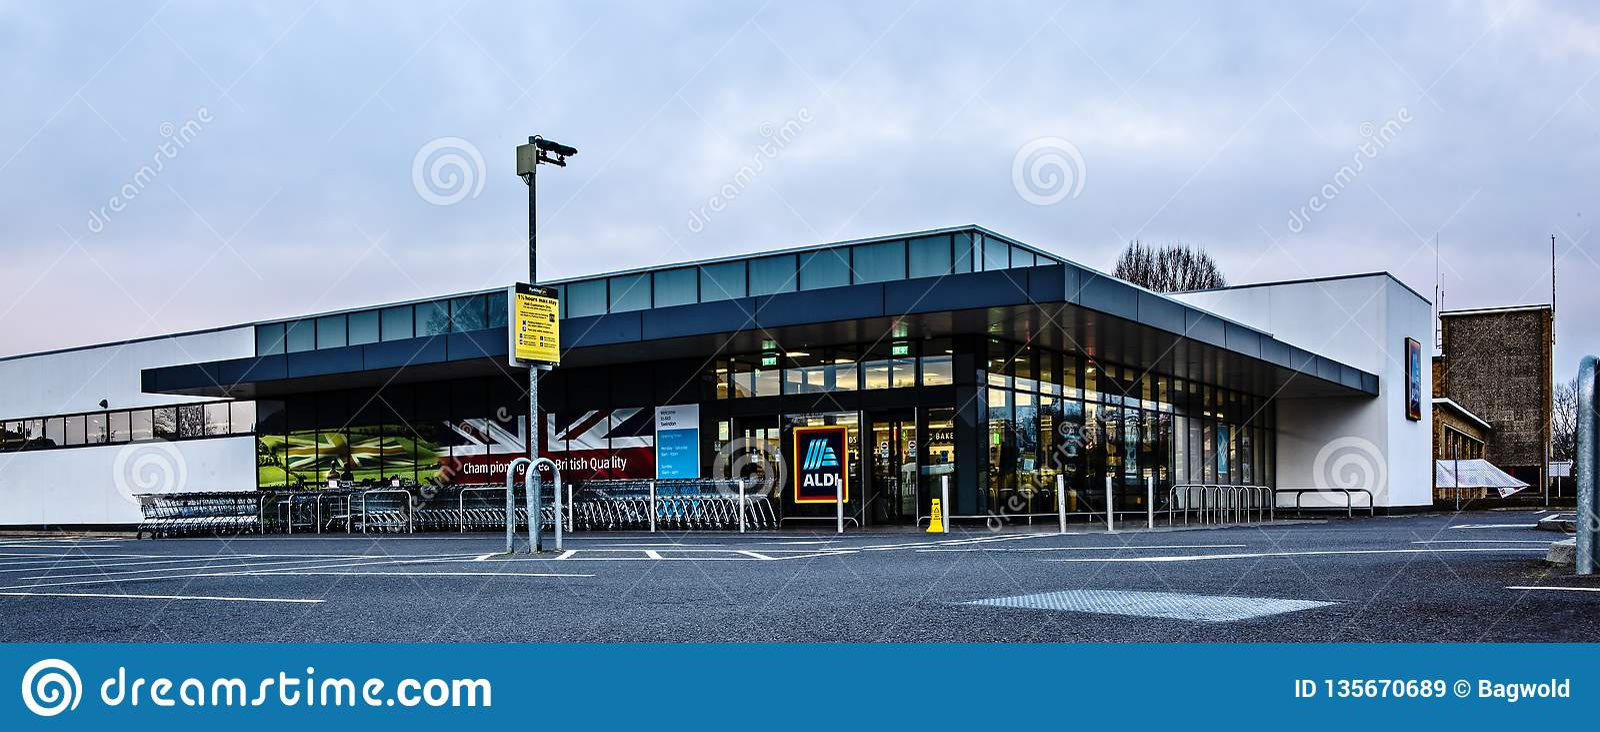 El supermercado de ALDI, condujo Rd, Swindon SN1 3AD